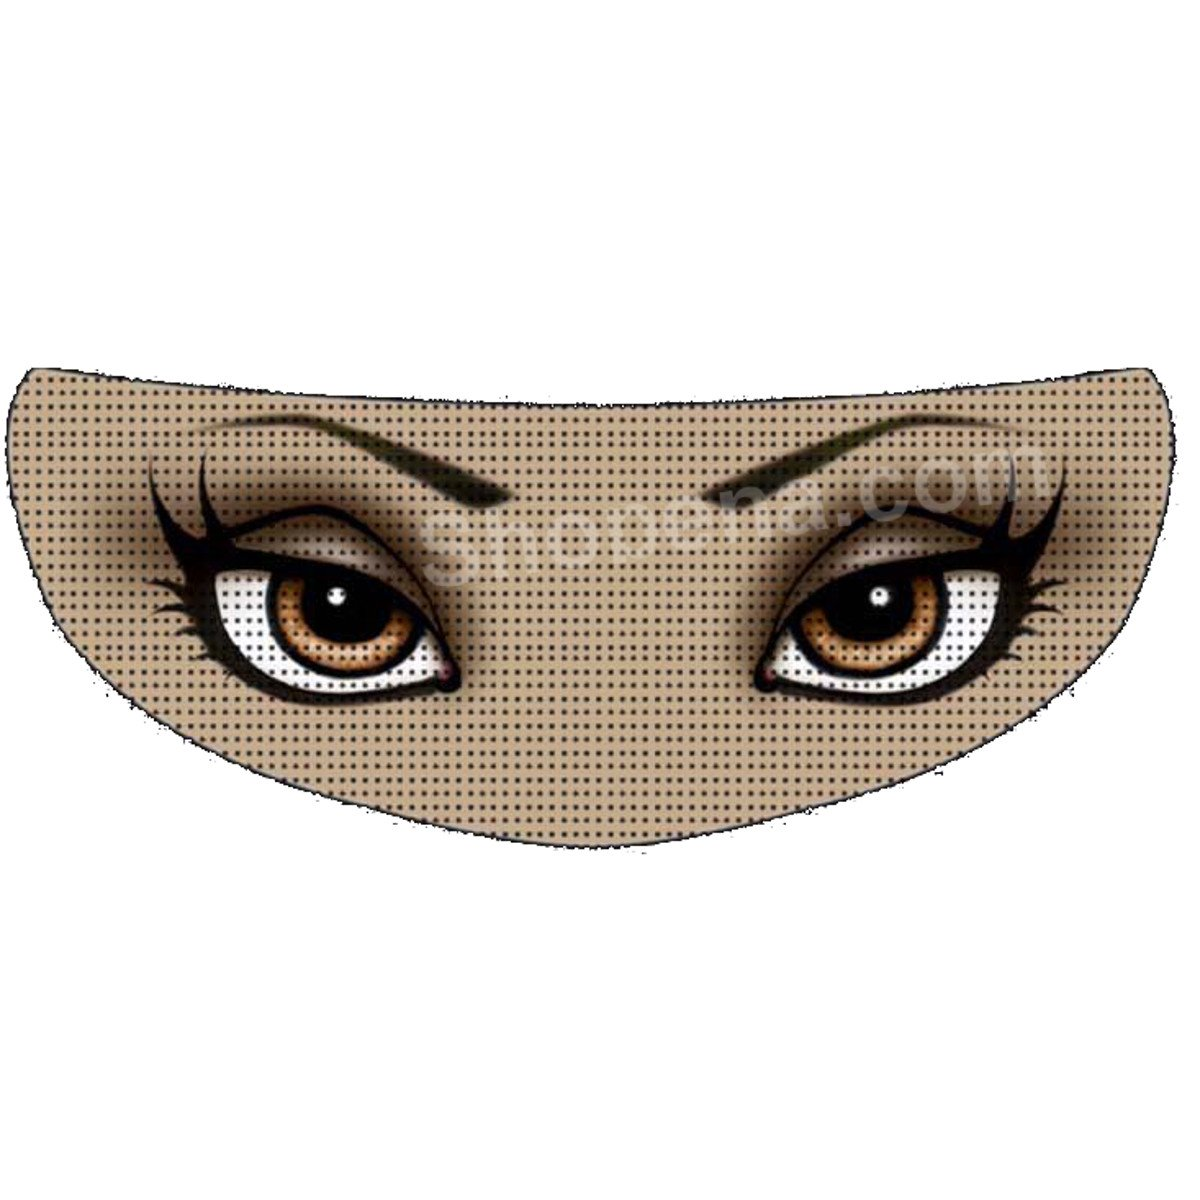 SkullSkins Babydoll 2 Lady Brown Eyes Universal Full Face Motorcycle Helmet Windscreen Graphic Visor Tint Shield Sticker Decal